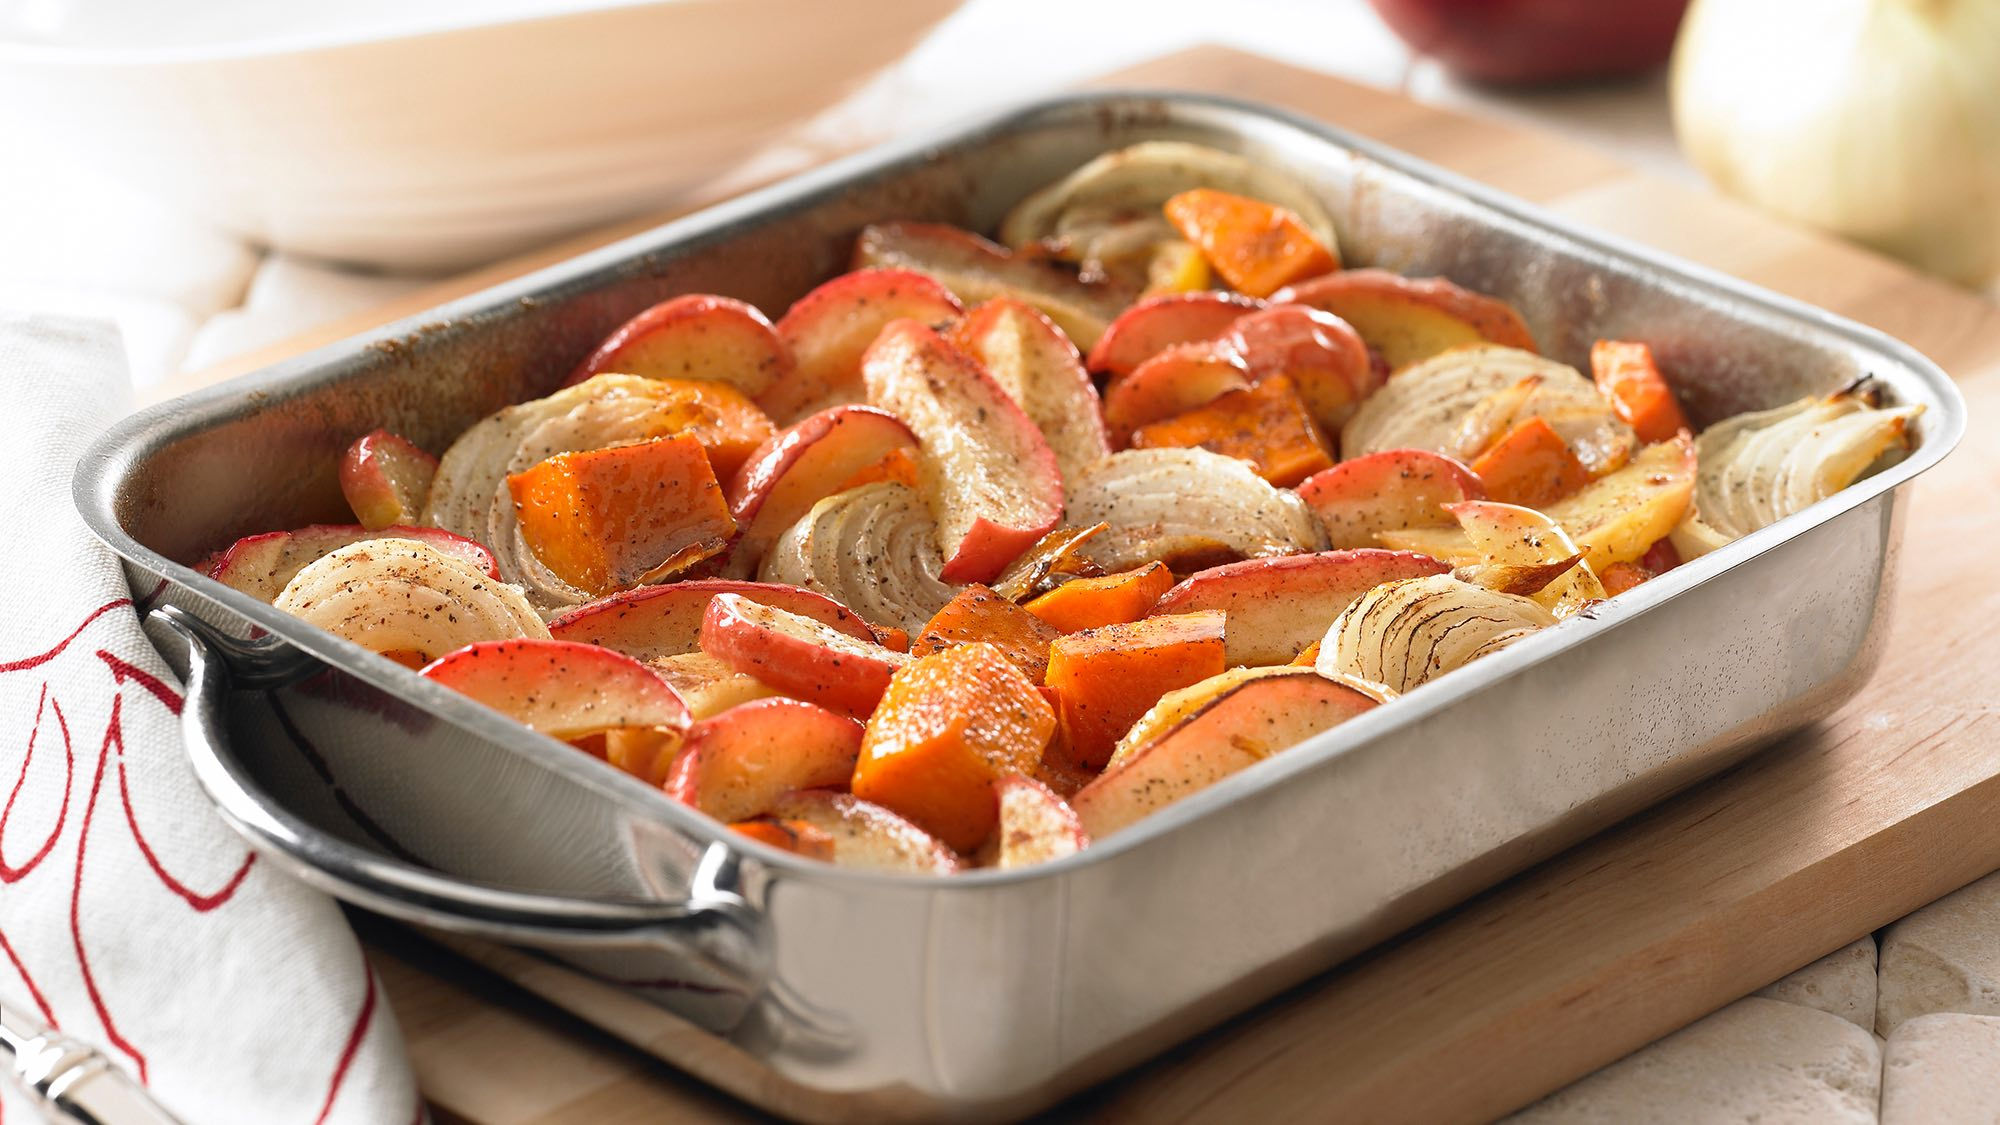 vanilla-glazed-roasted-squash-and-apples.jpg